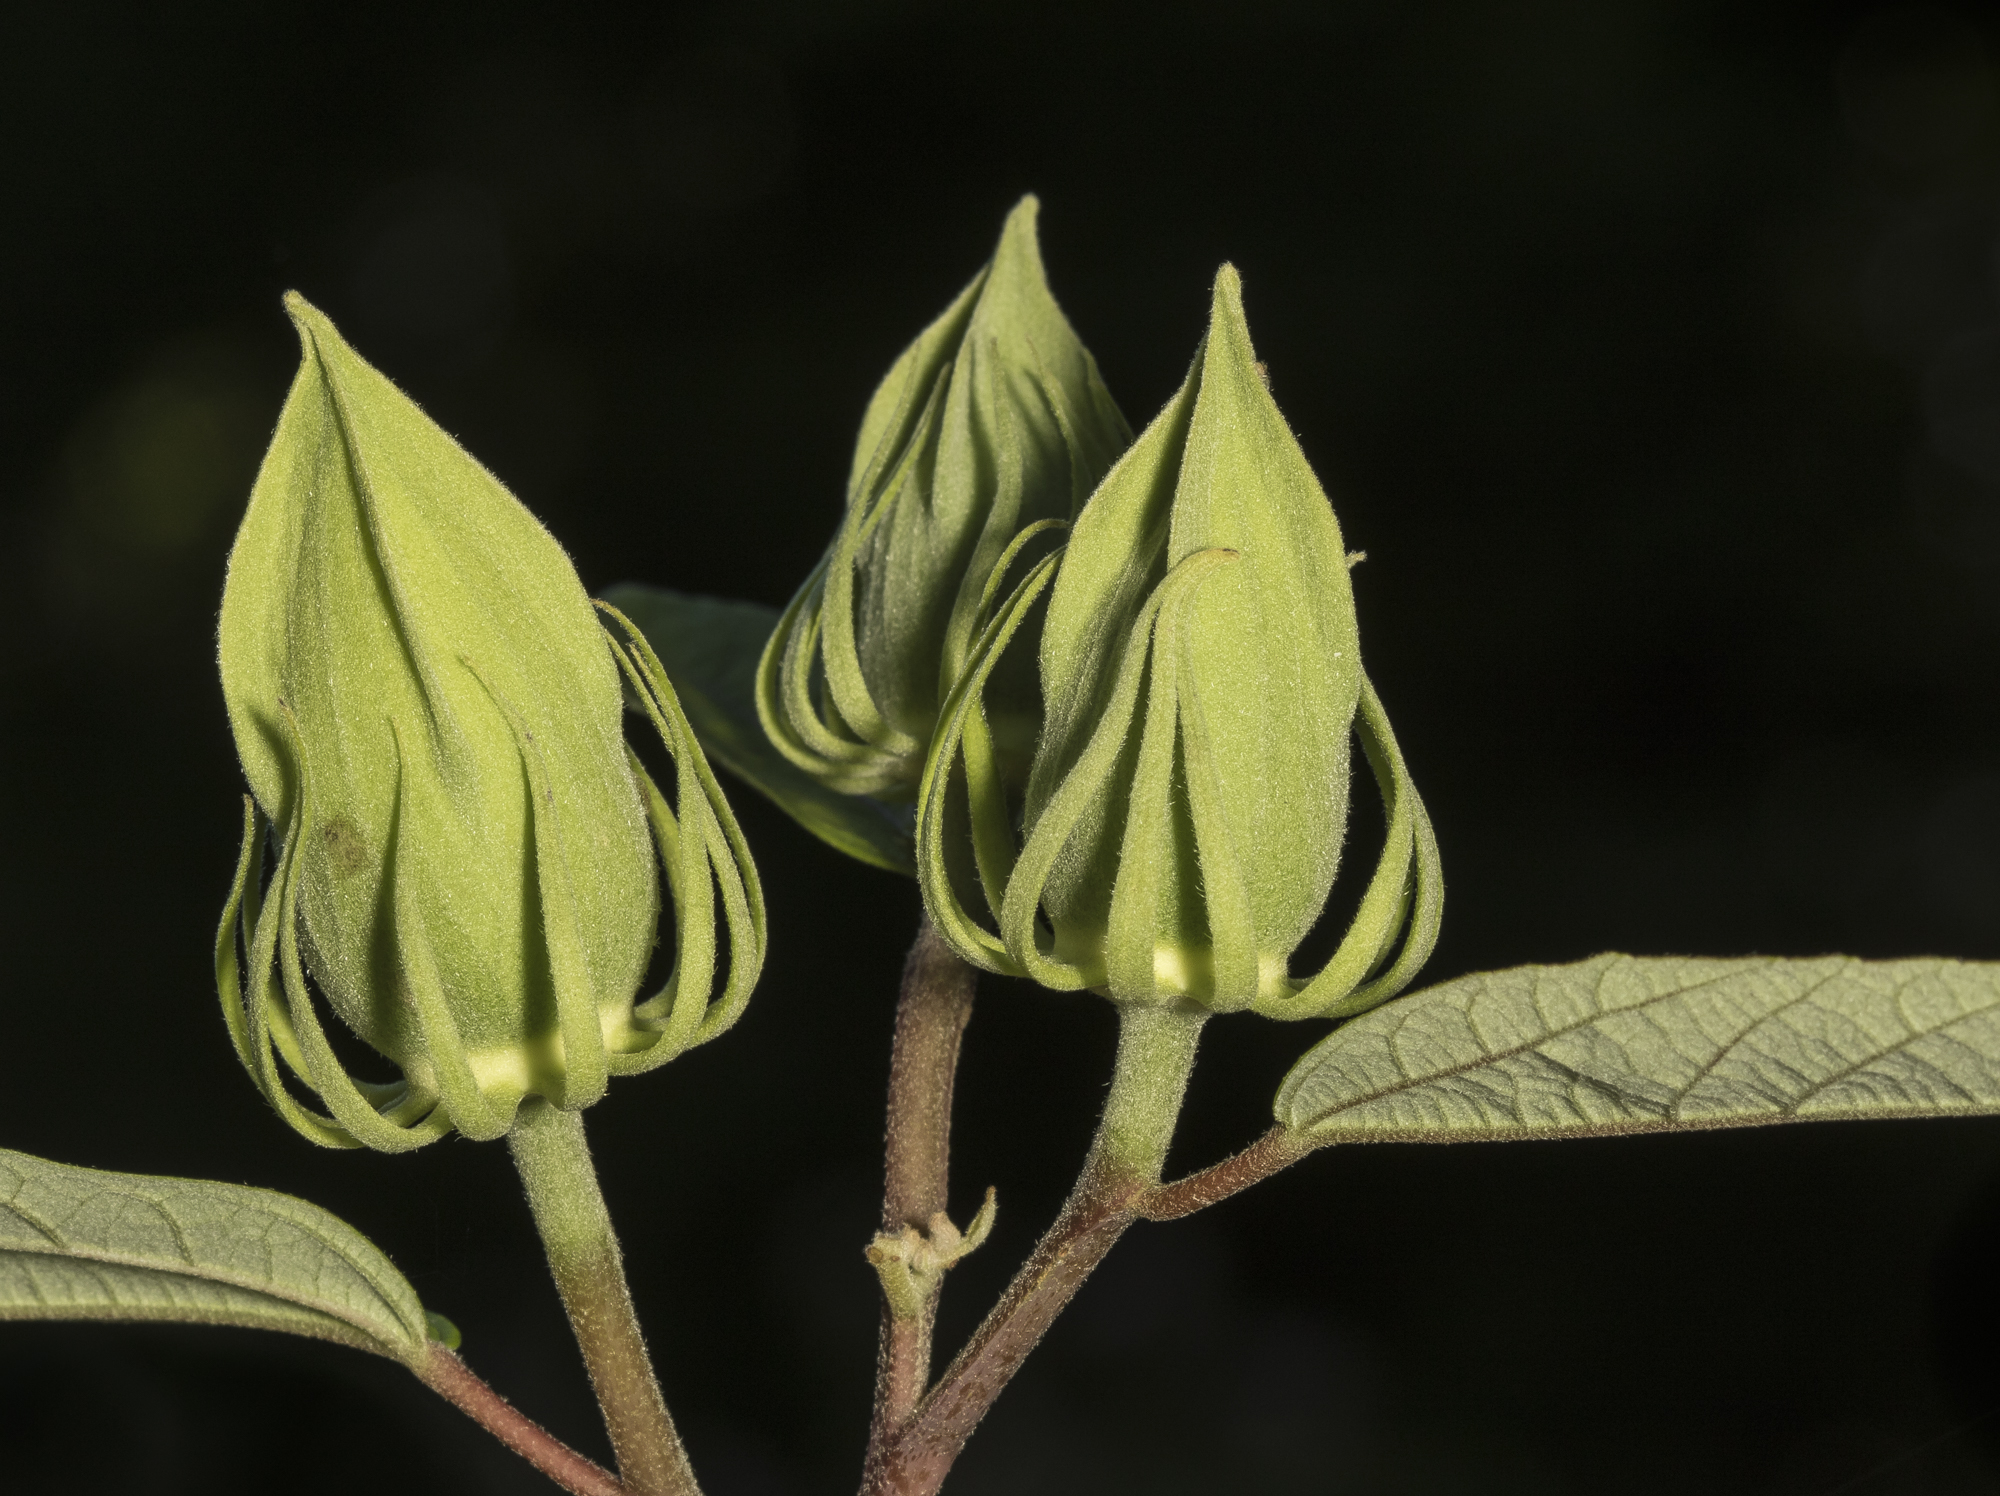 Hibiscus flower buds